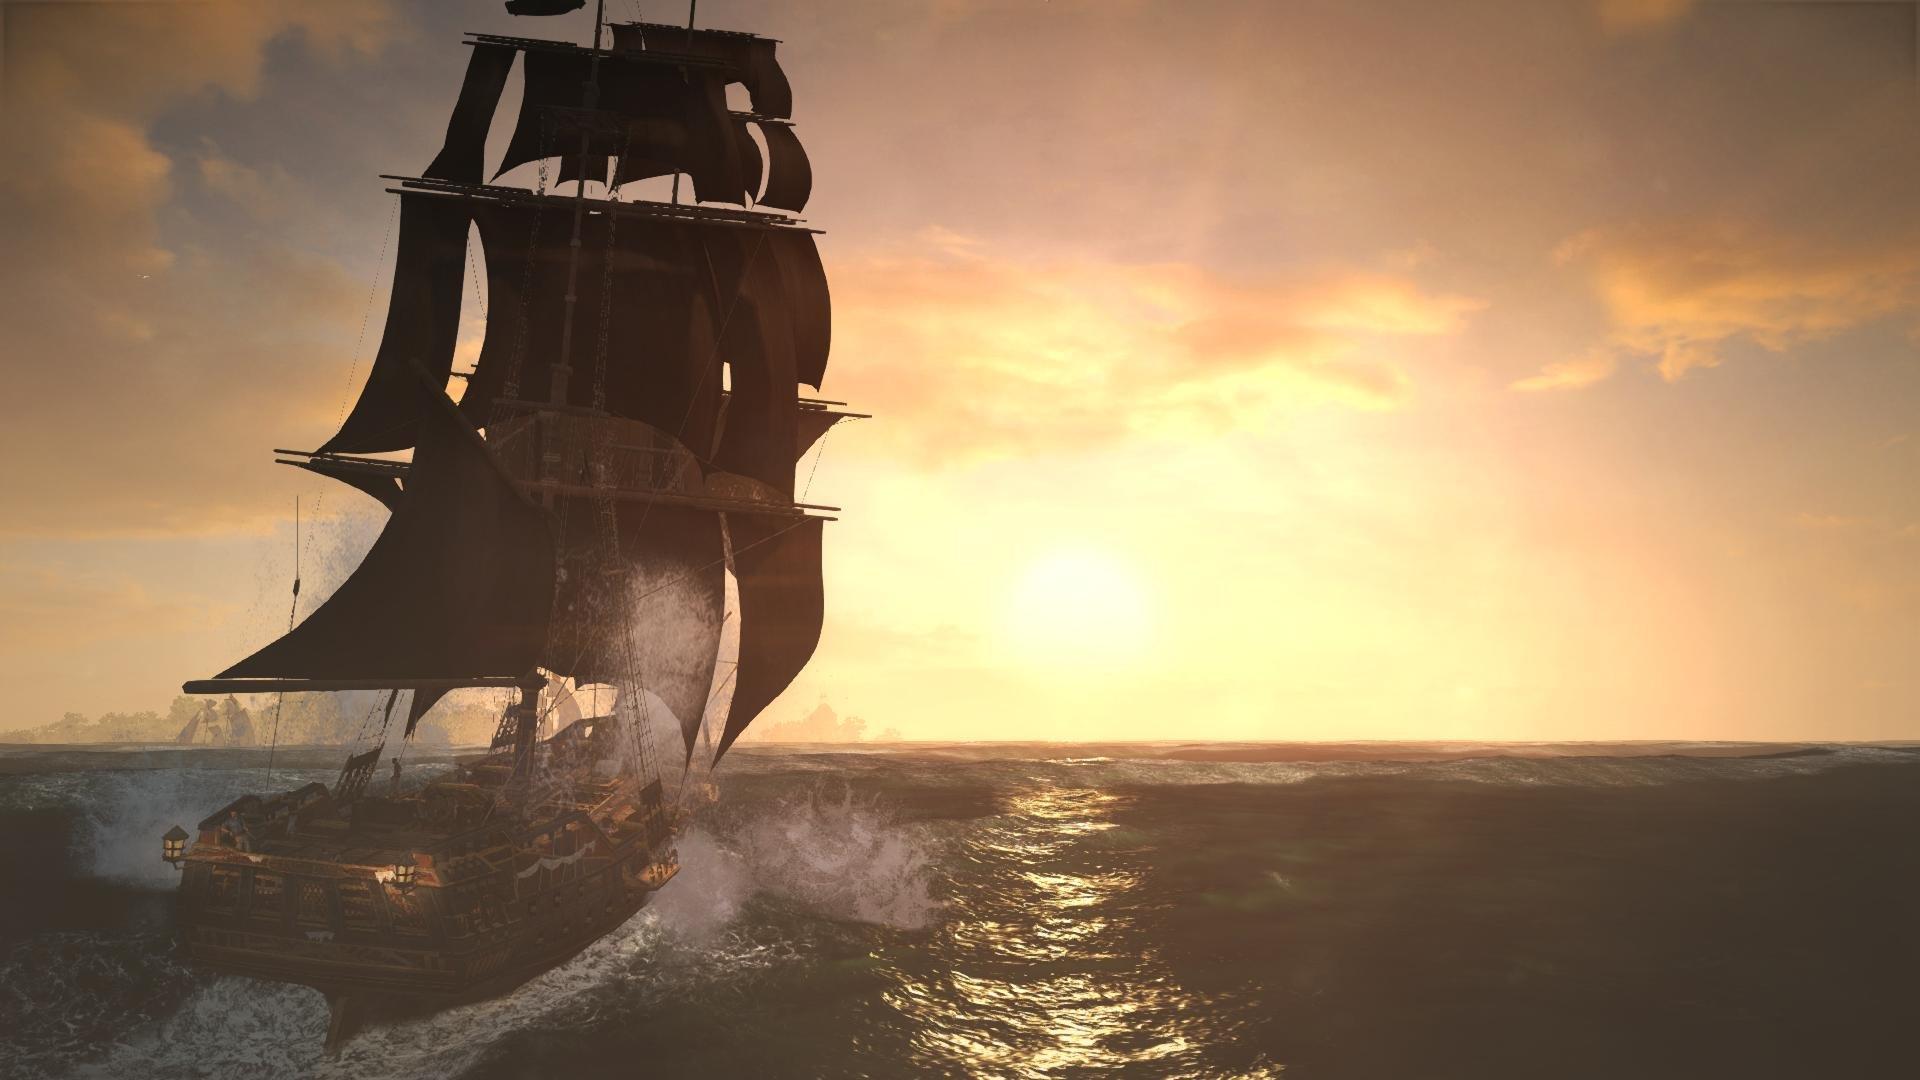 assassins creed black flag ship wallpaper images